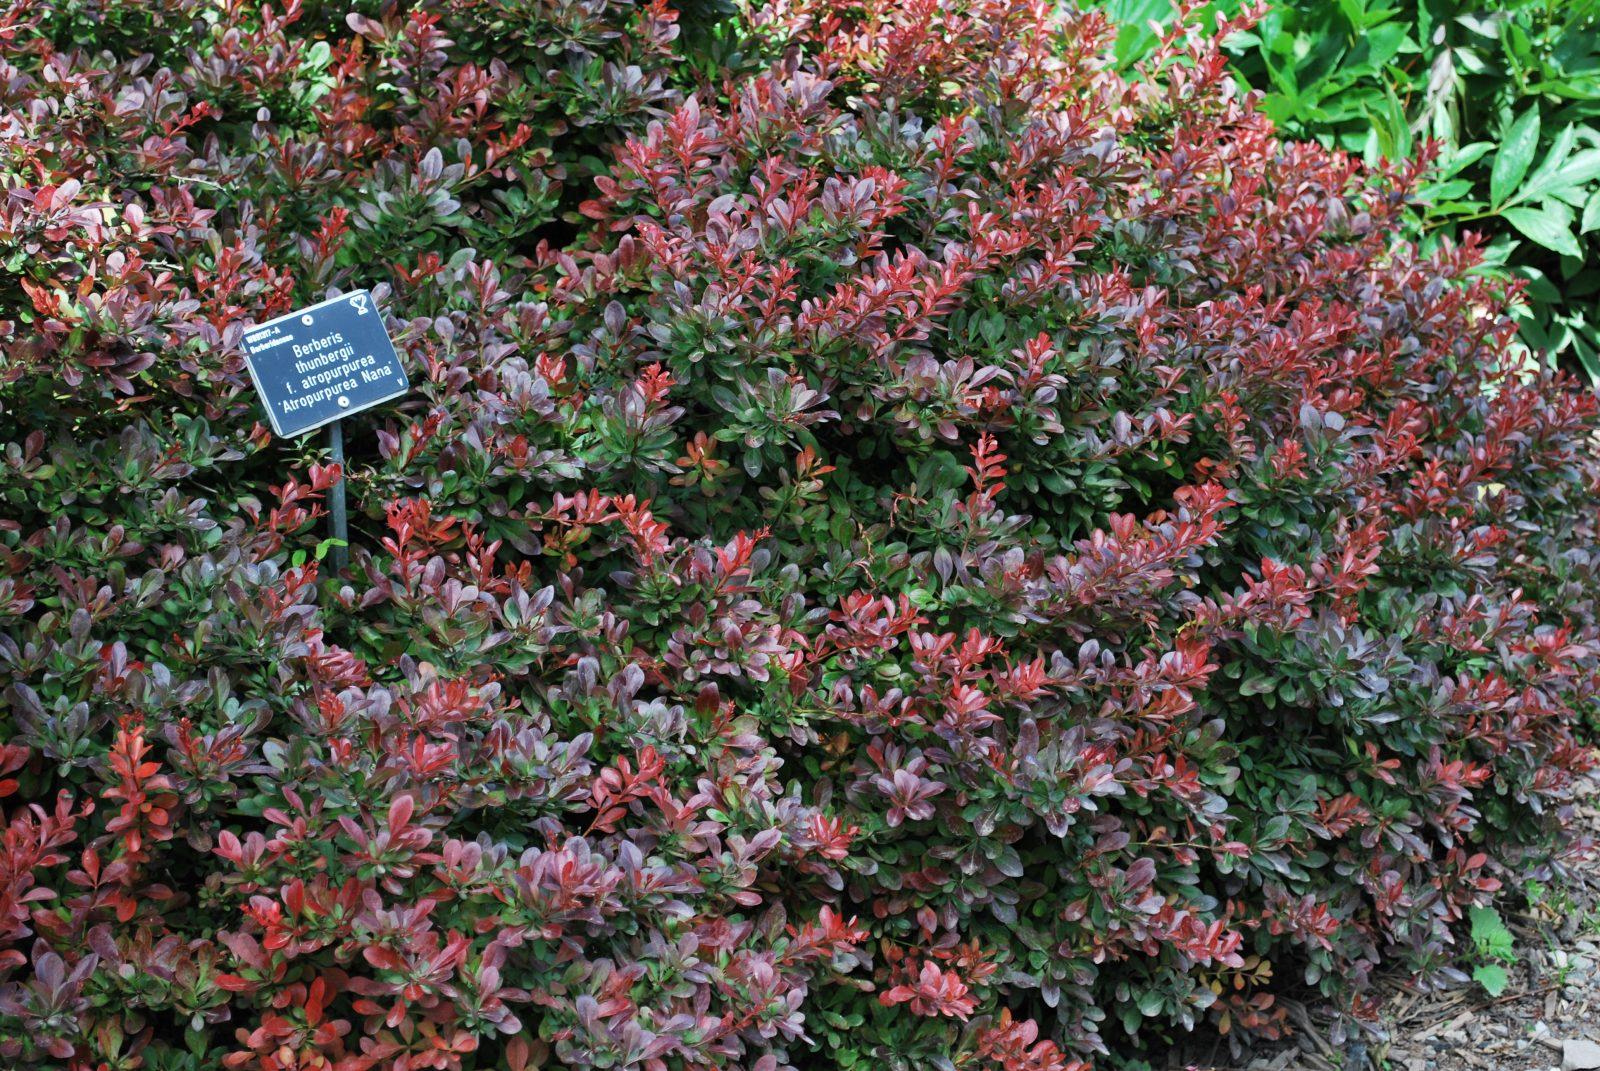 berberis thunbergii atropurpurea nana let 39 s go planting. Black Bedroom Furniture Sets. Home Design Ideas